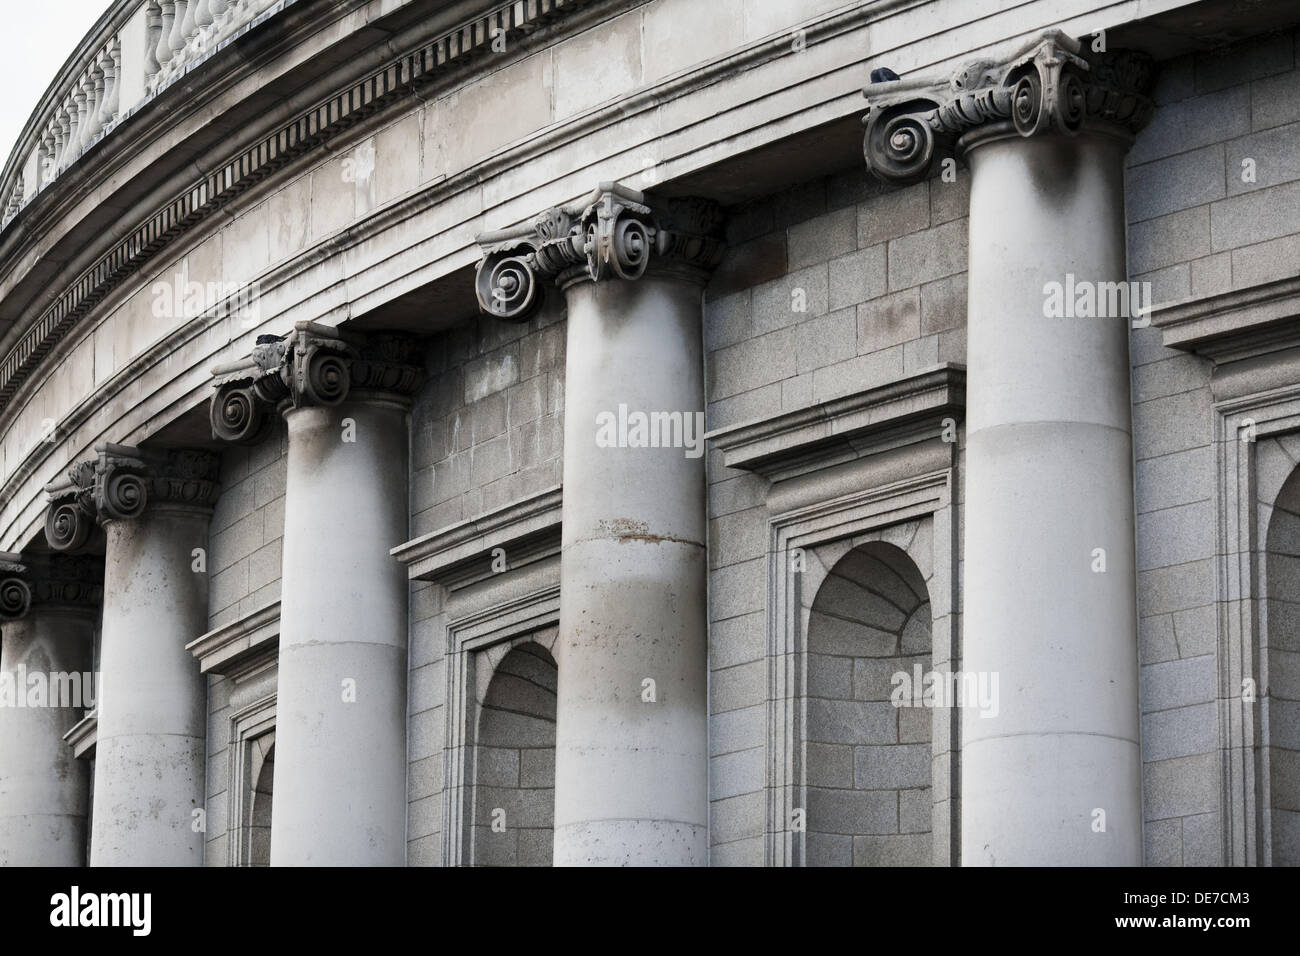 Detail of the Bank of Ireland building, Dublin, Ireland - Stock Image